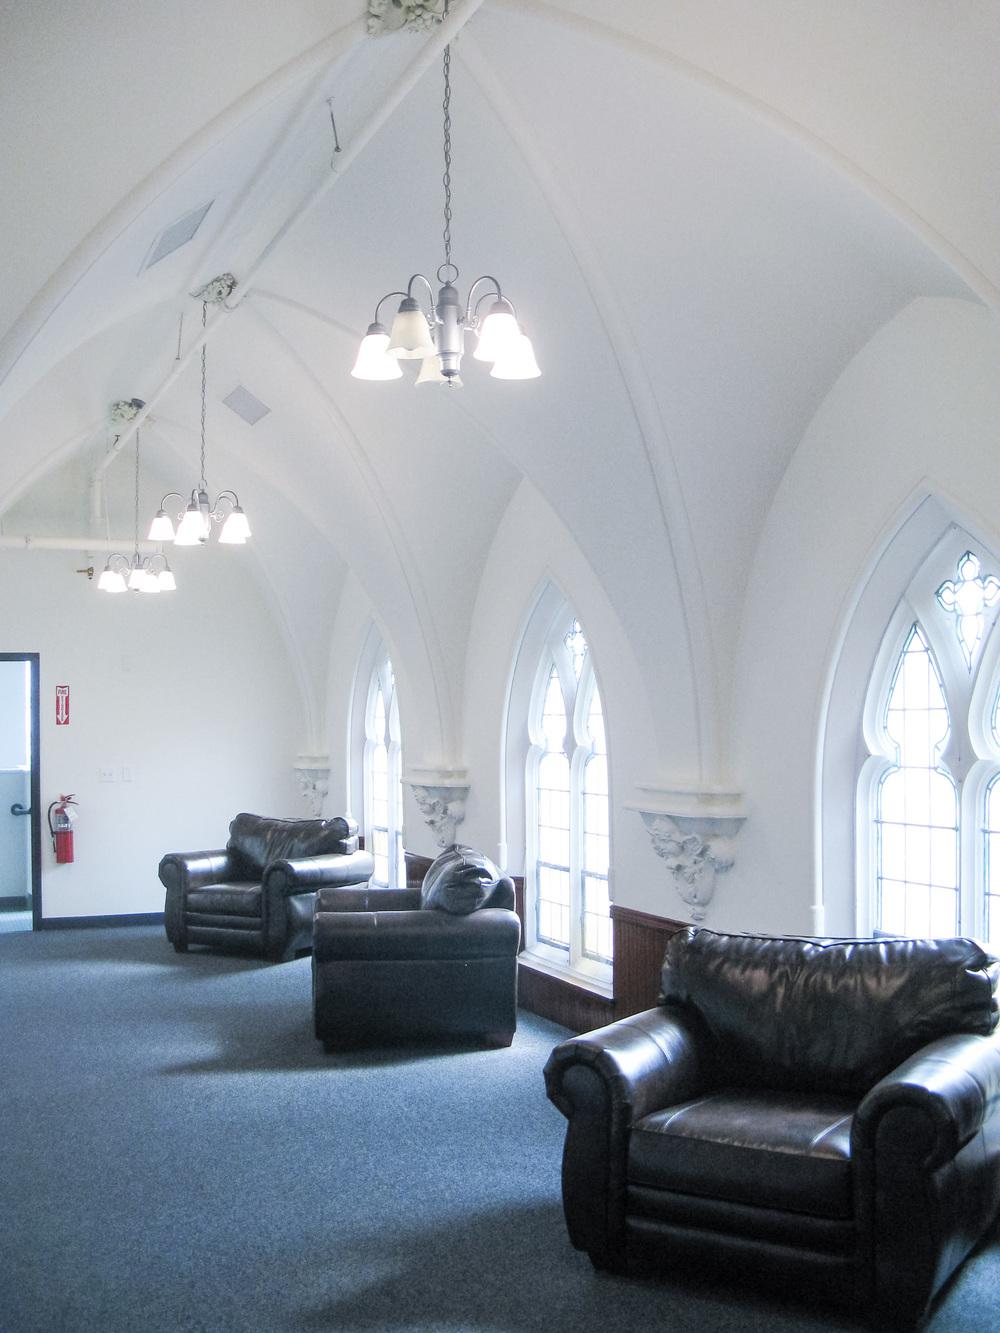 big-dog-painting-church-vaults-interiors.jpg